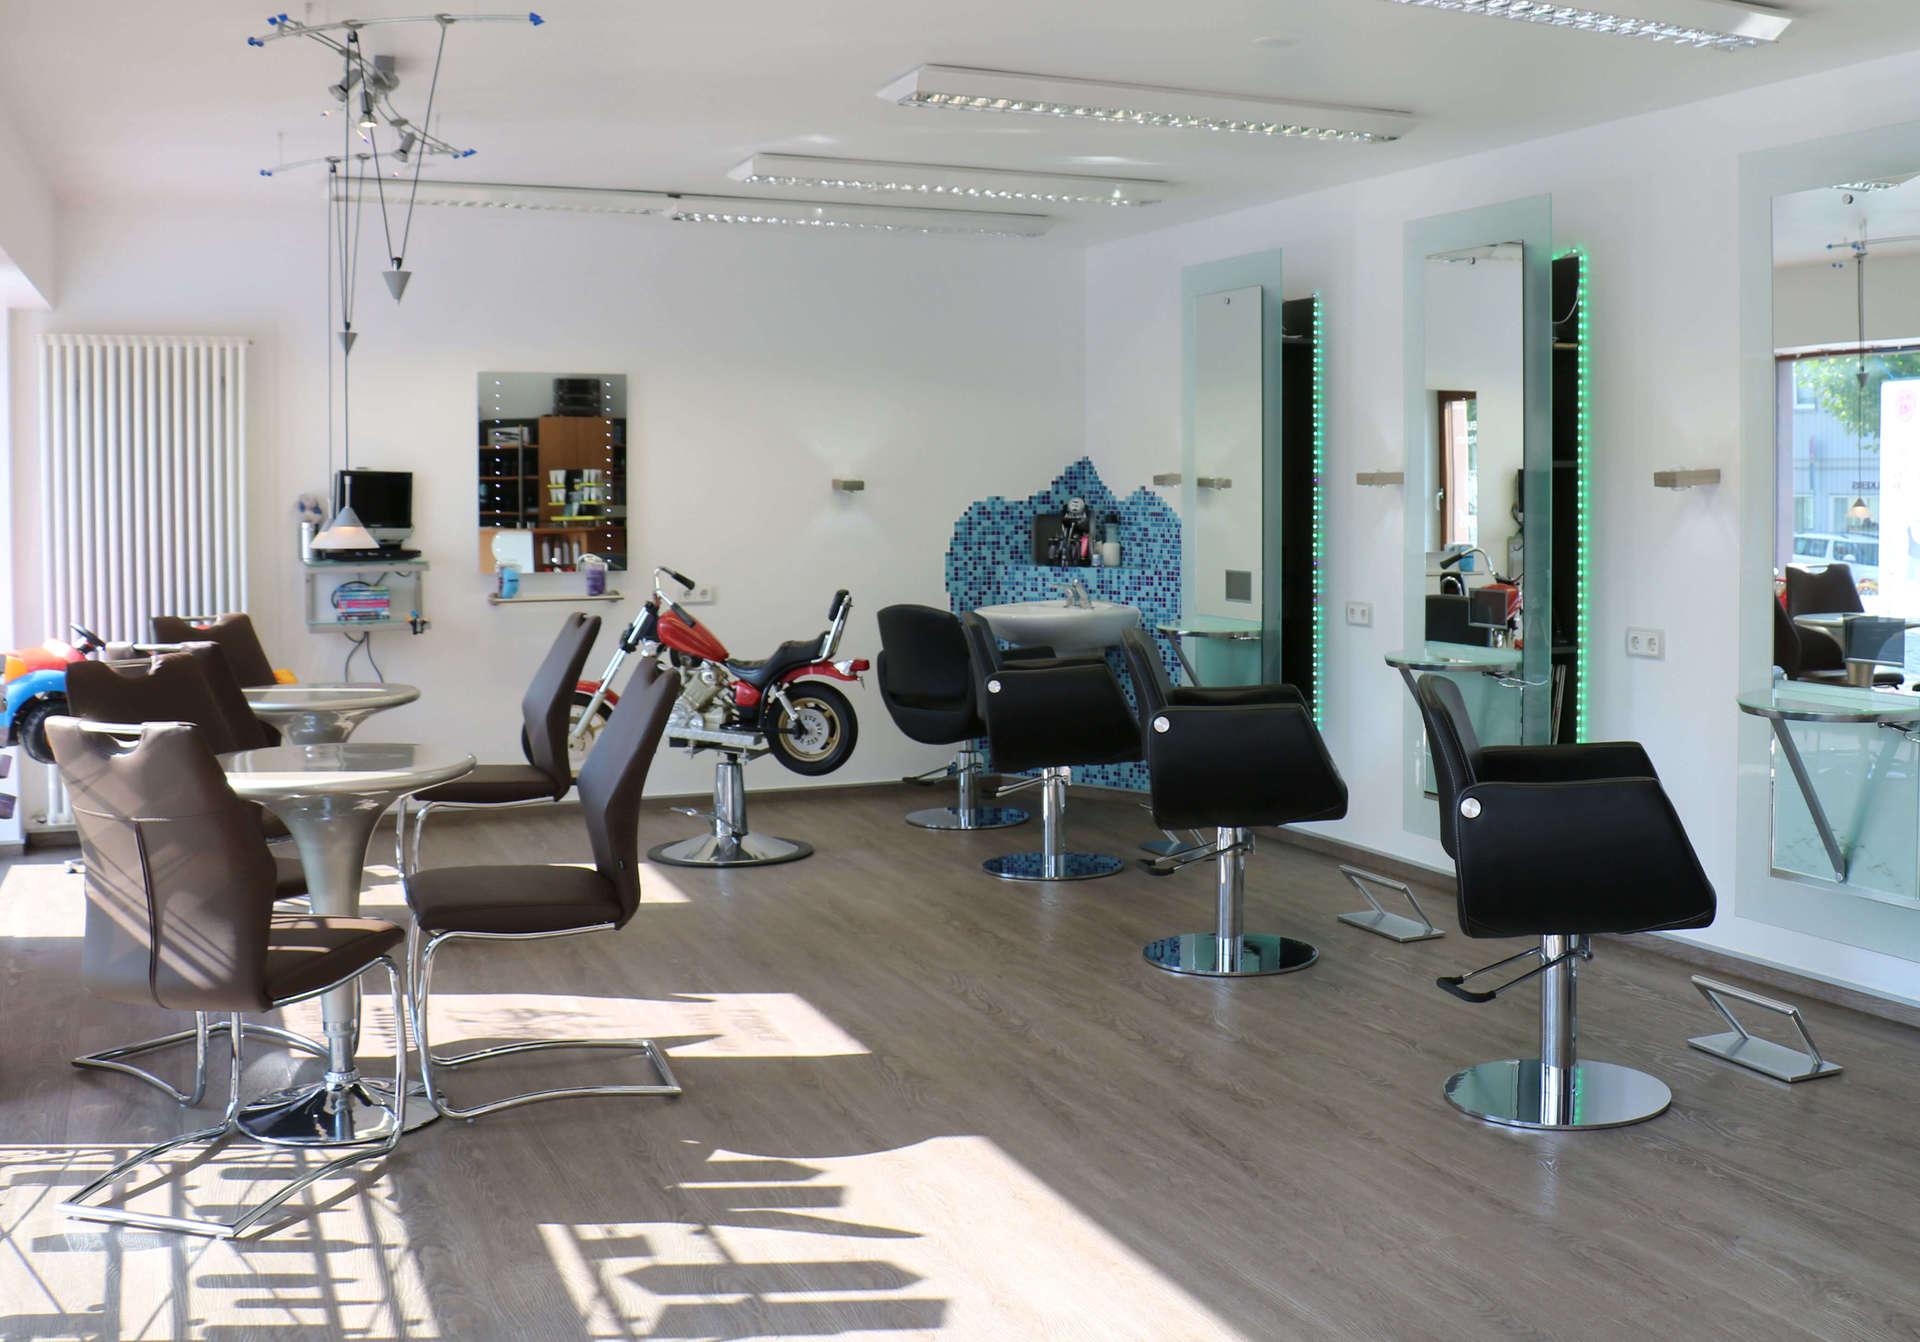 Salon - Friseursalon Ruppel Oberursel